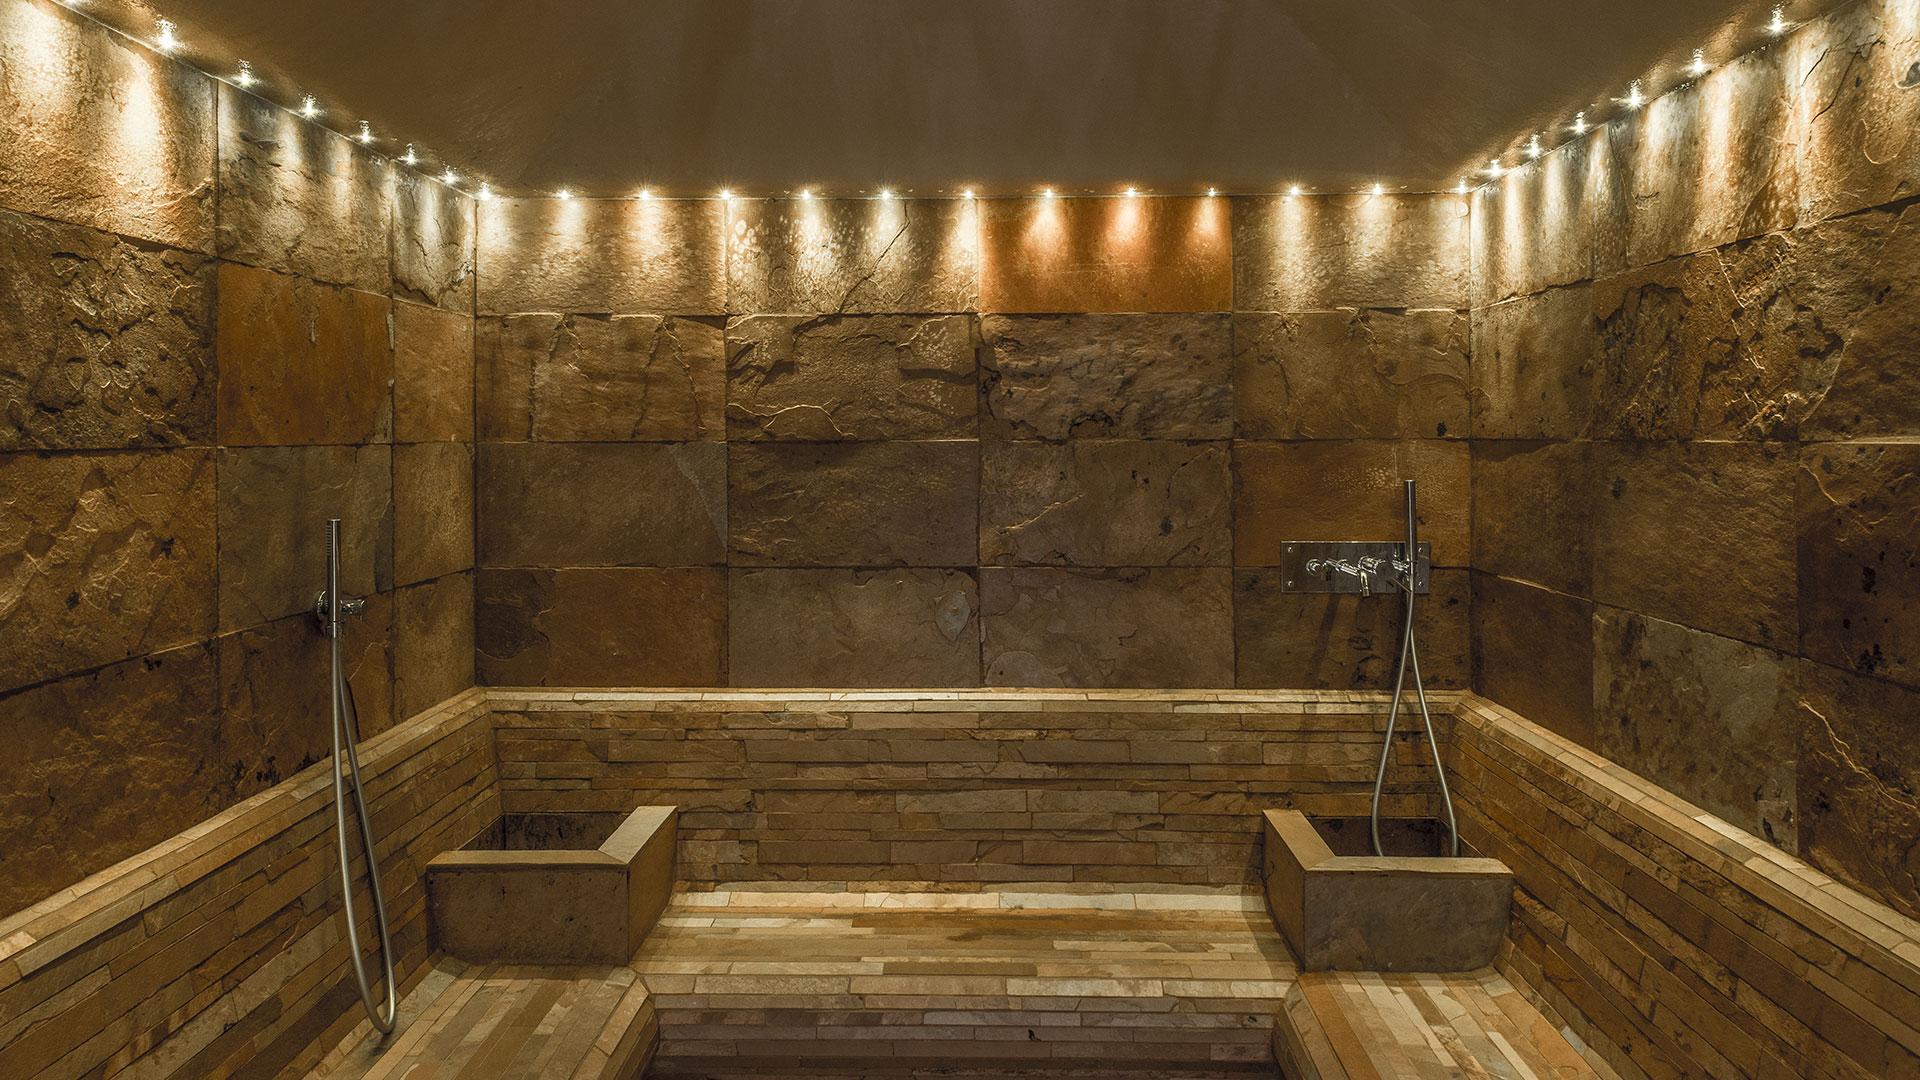 acquista su agritechstore le essenze per bagnoturco e sauna